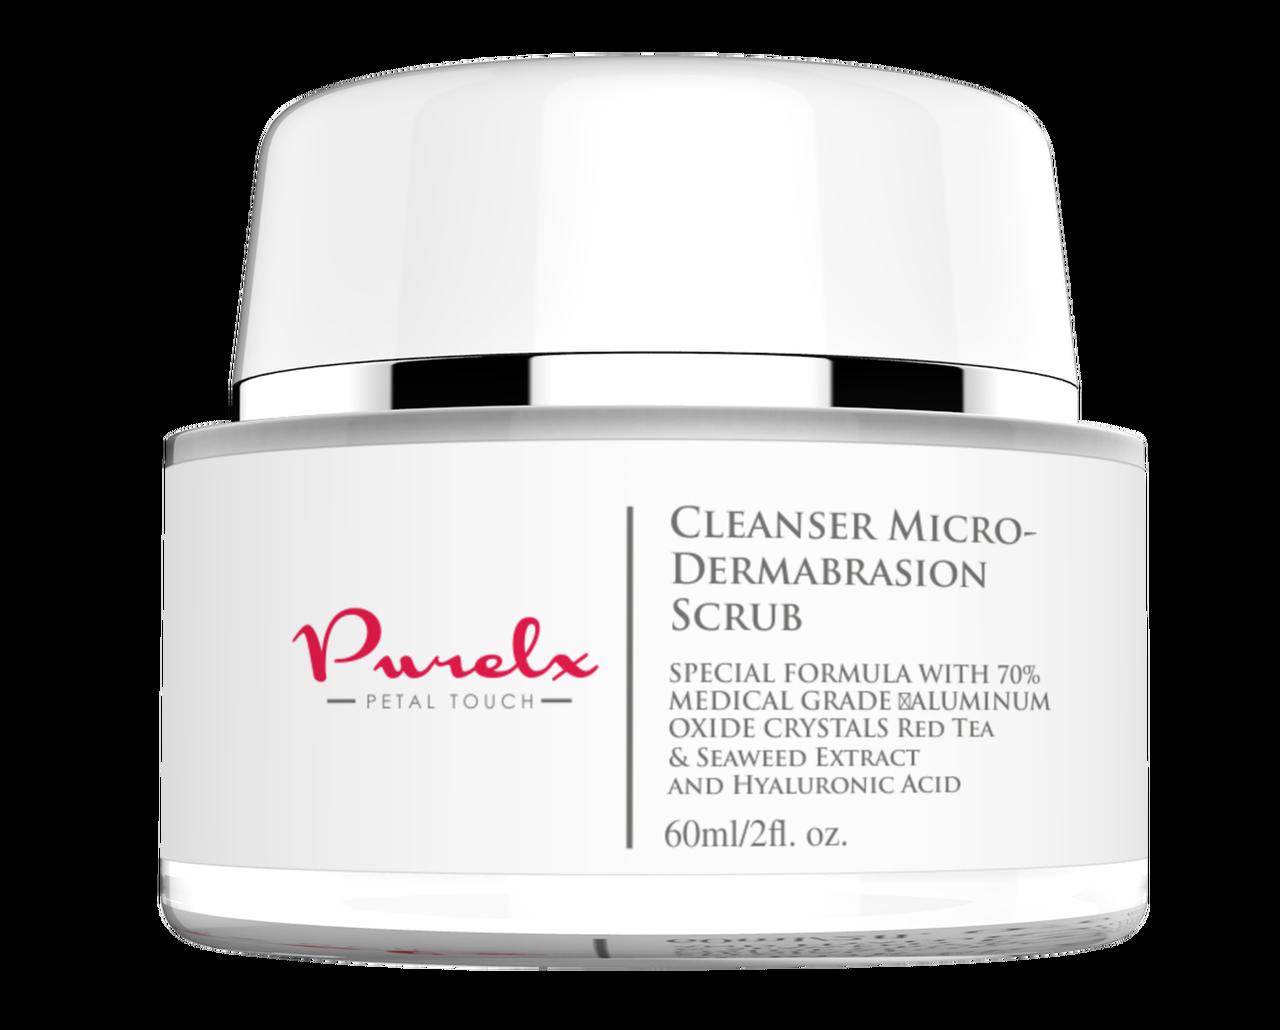 Cleanser Micro-Dermabrasion Scrub